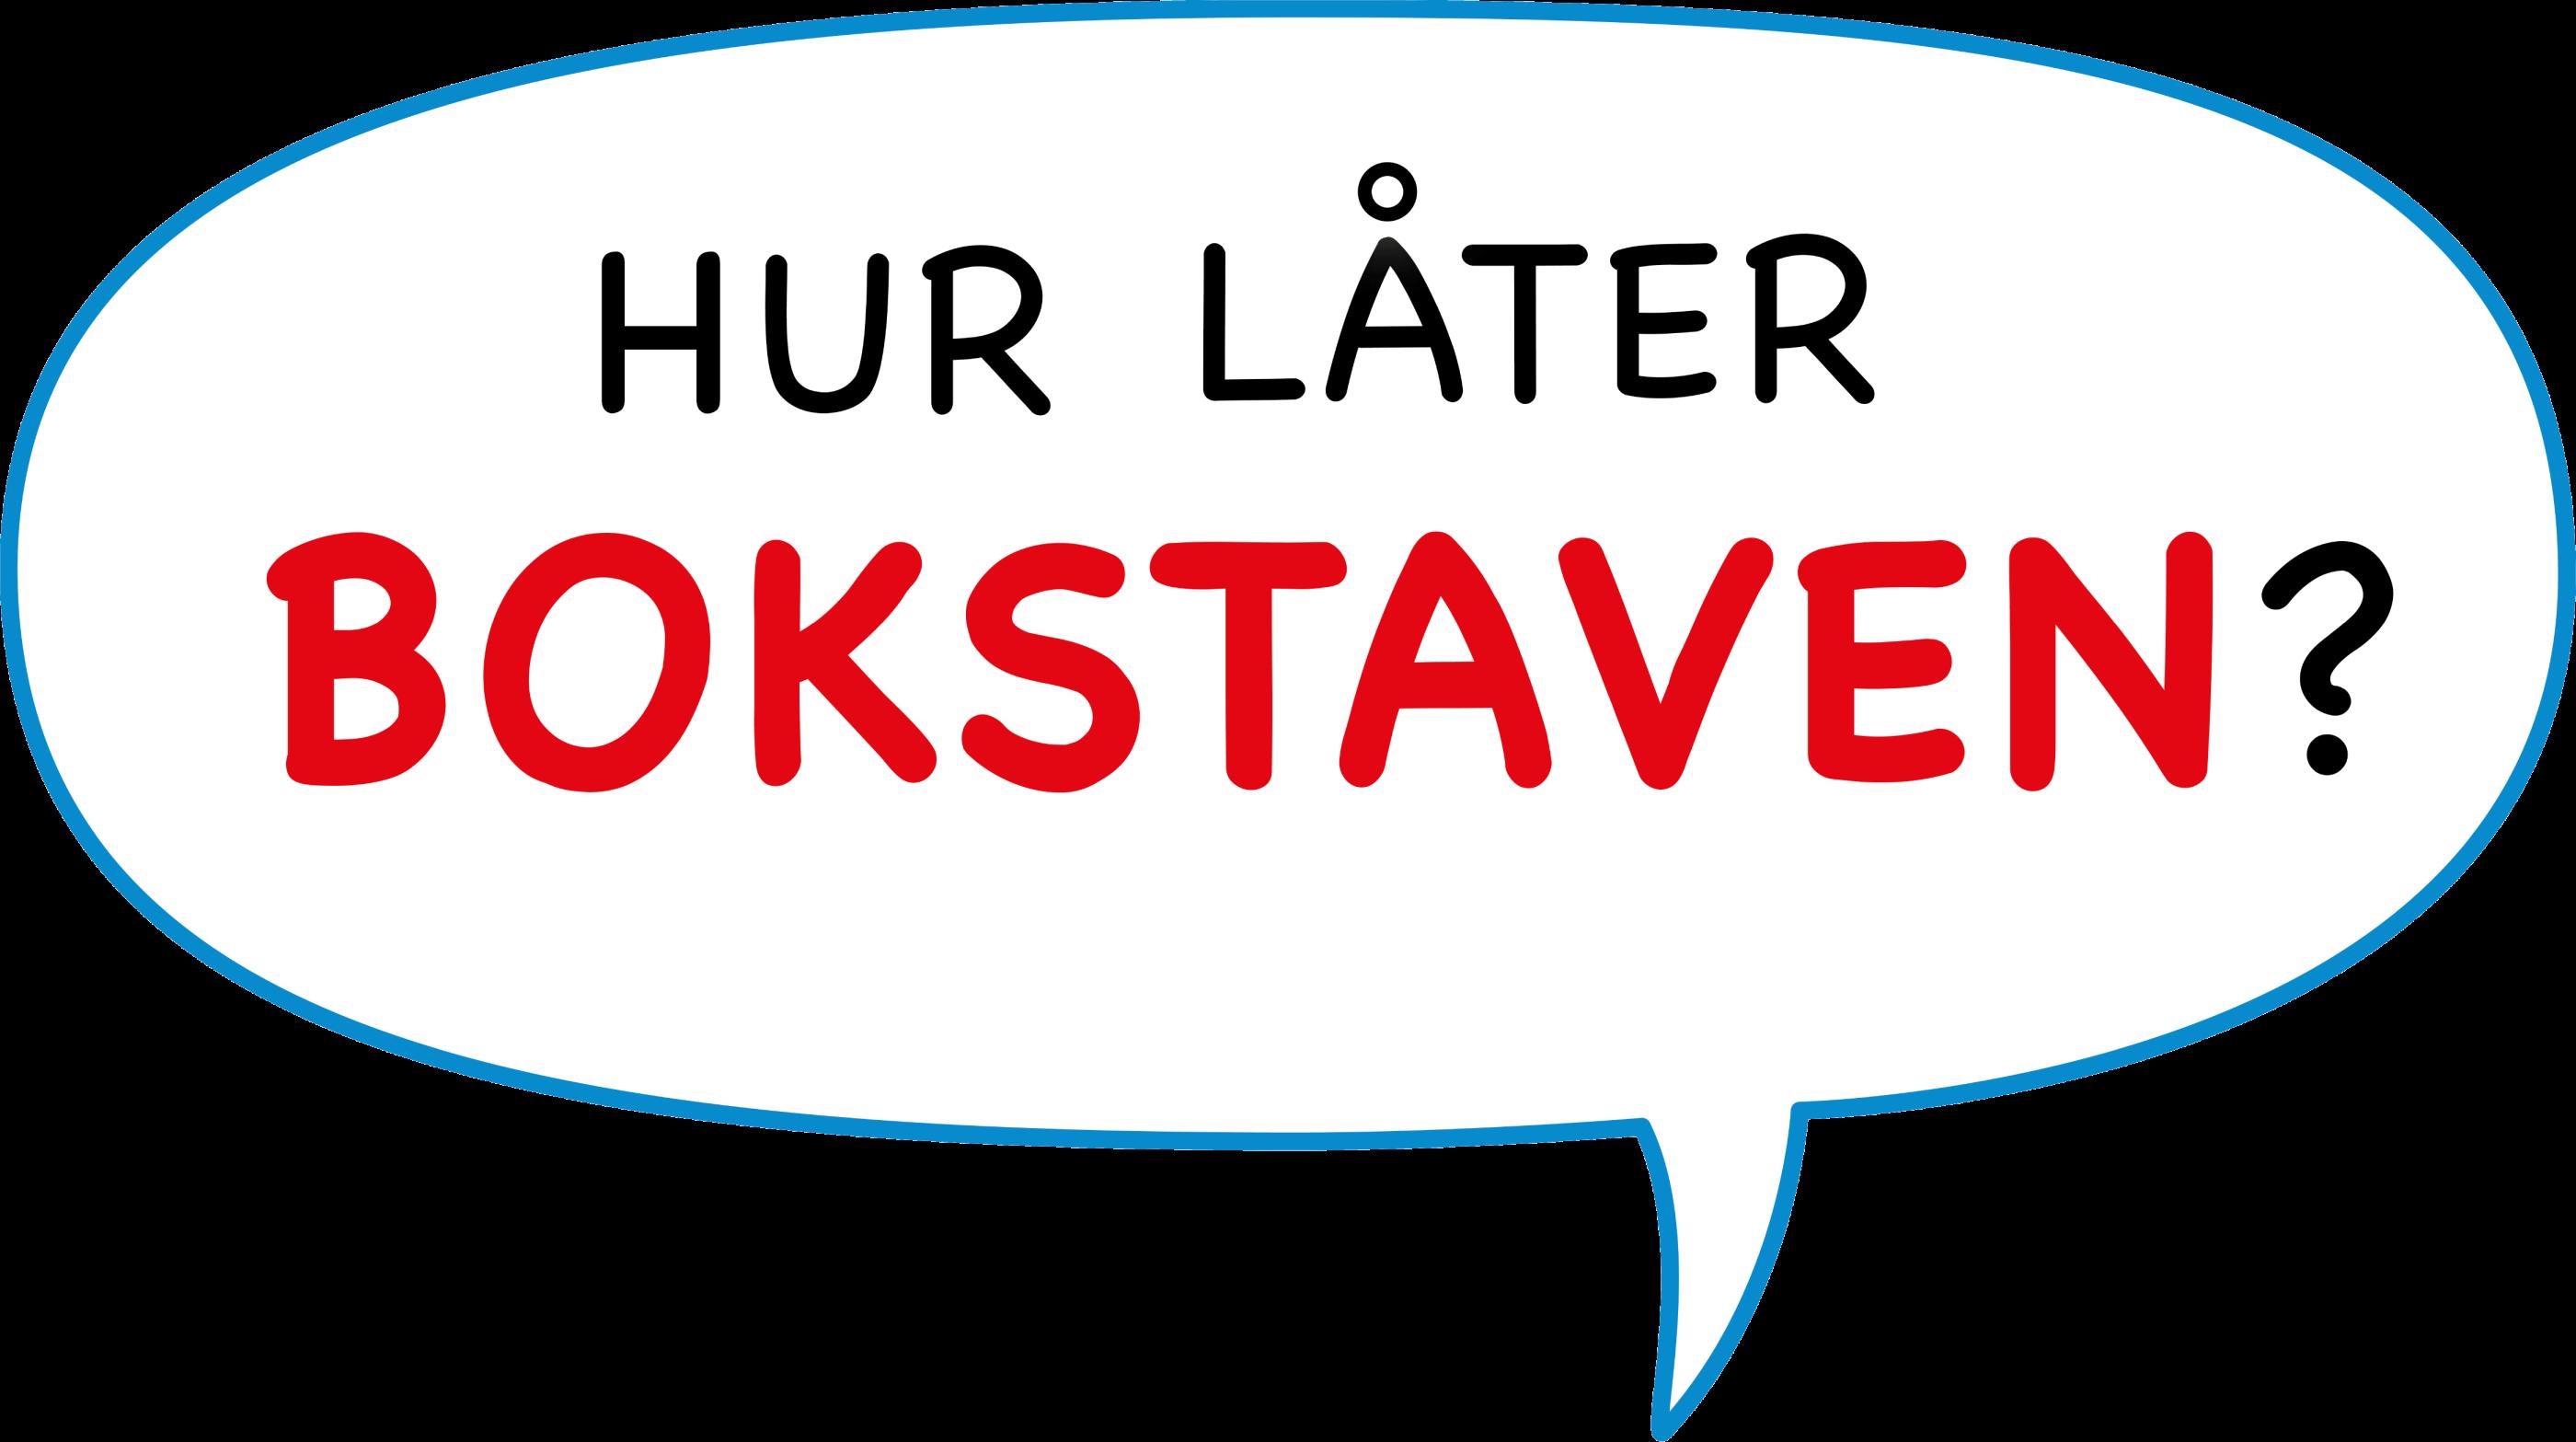 Hurlaterbokstaven_logga_180504